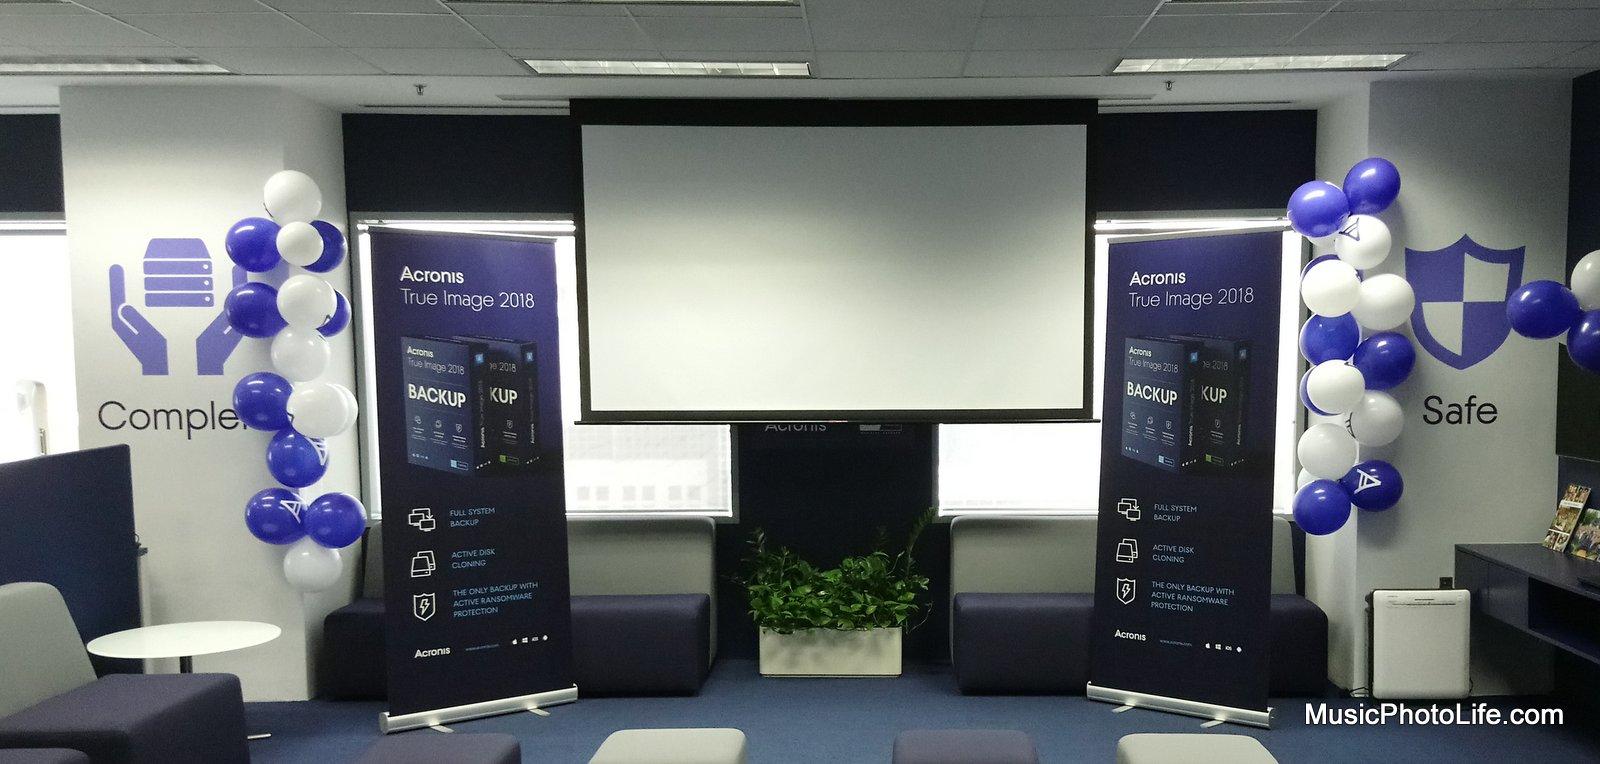 Acronis True Image 2018 launch event in Singapore